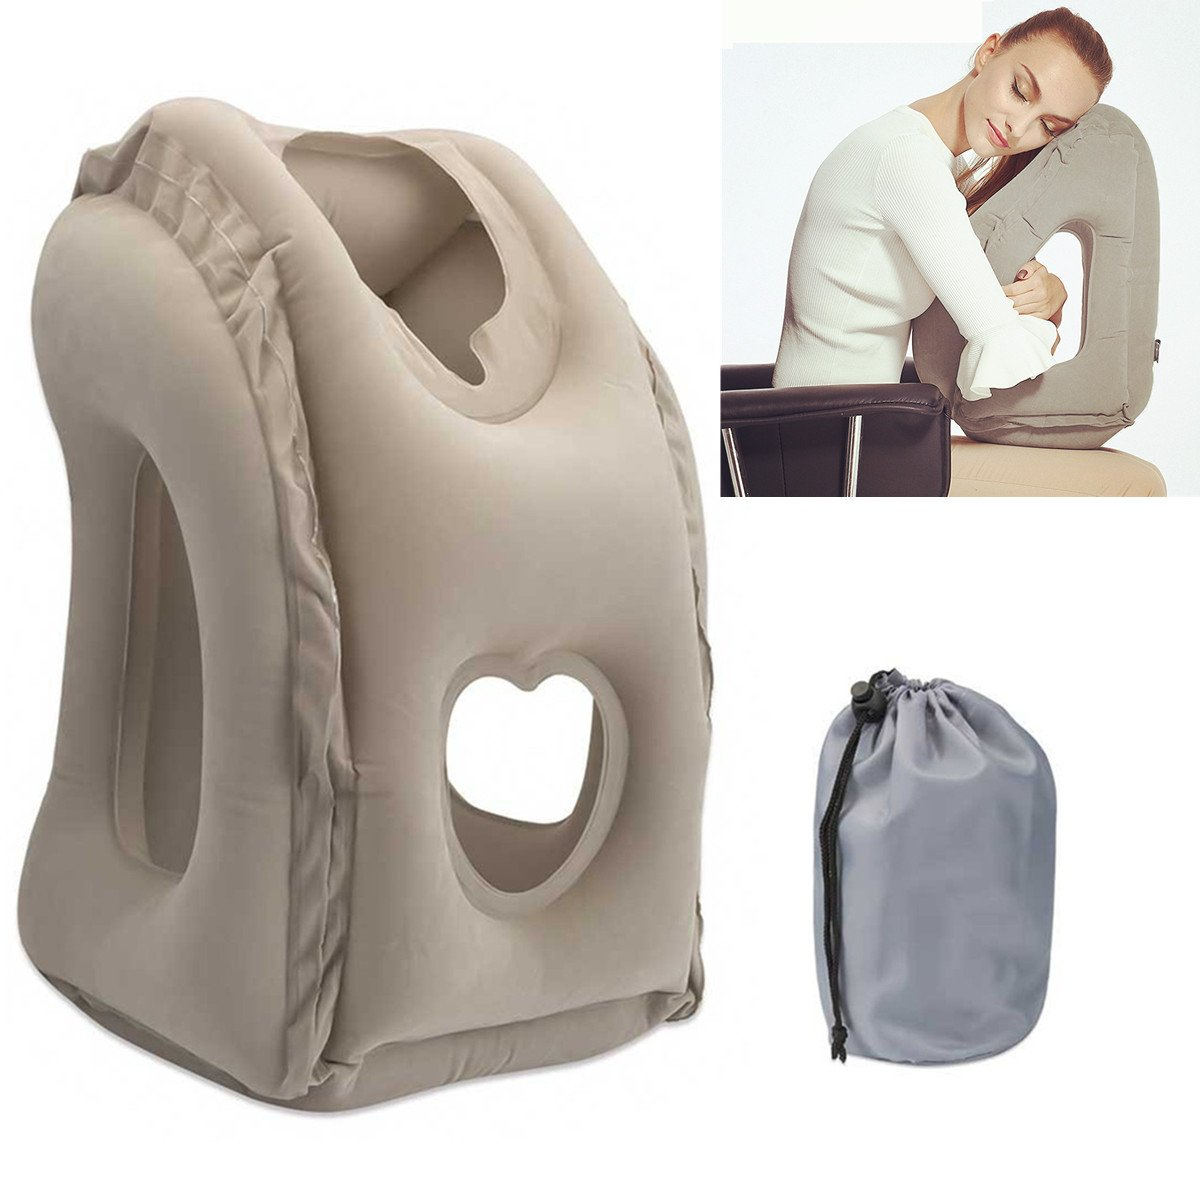 Cabeau Evolution S3 Travel Pillow Steel 1540958424 5898